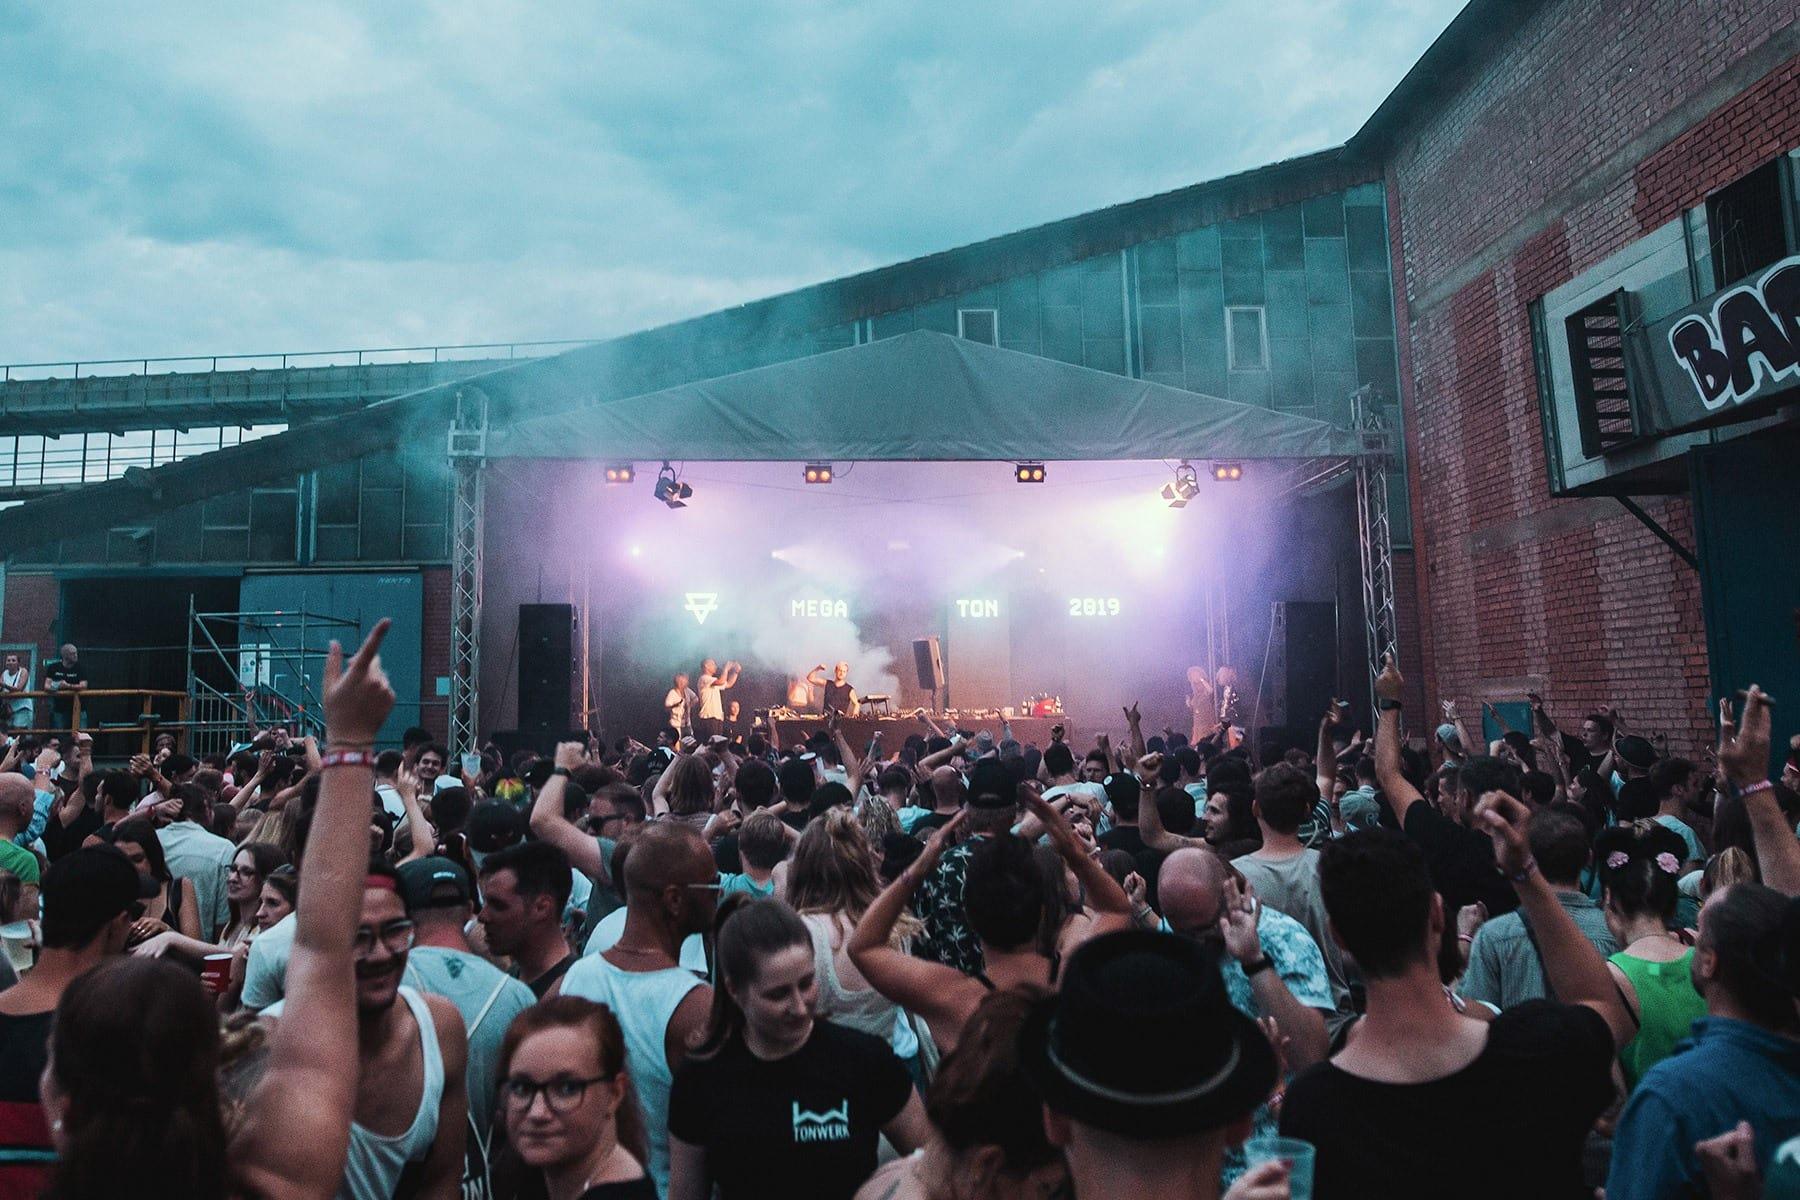 Megaton Festival